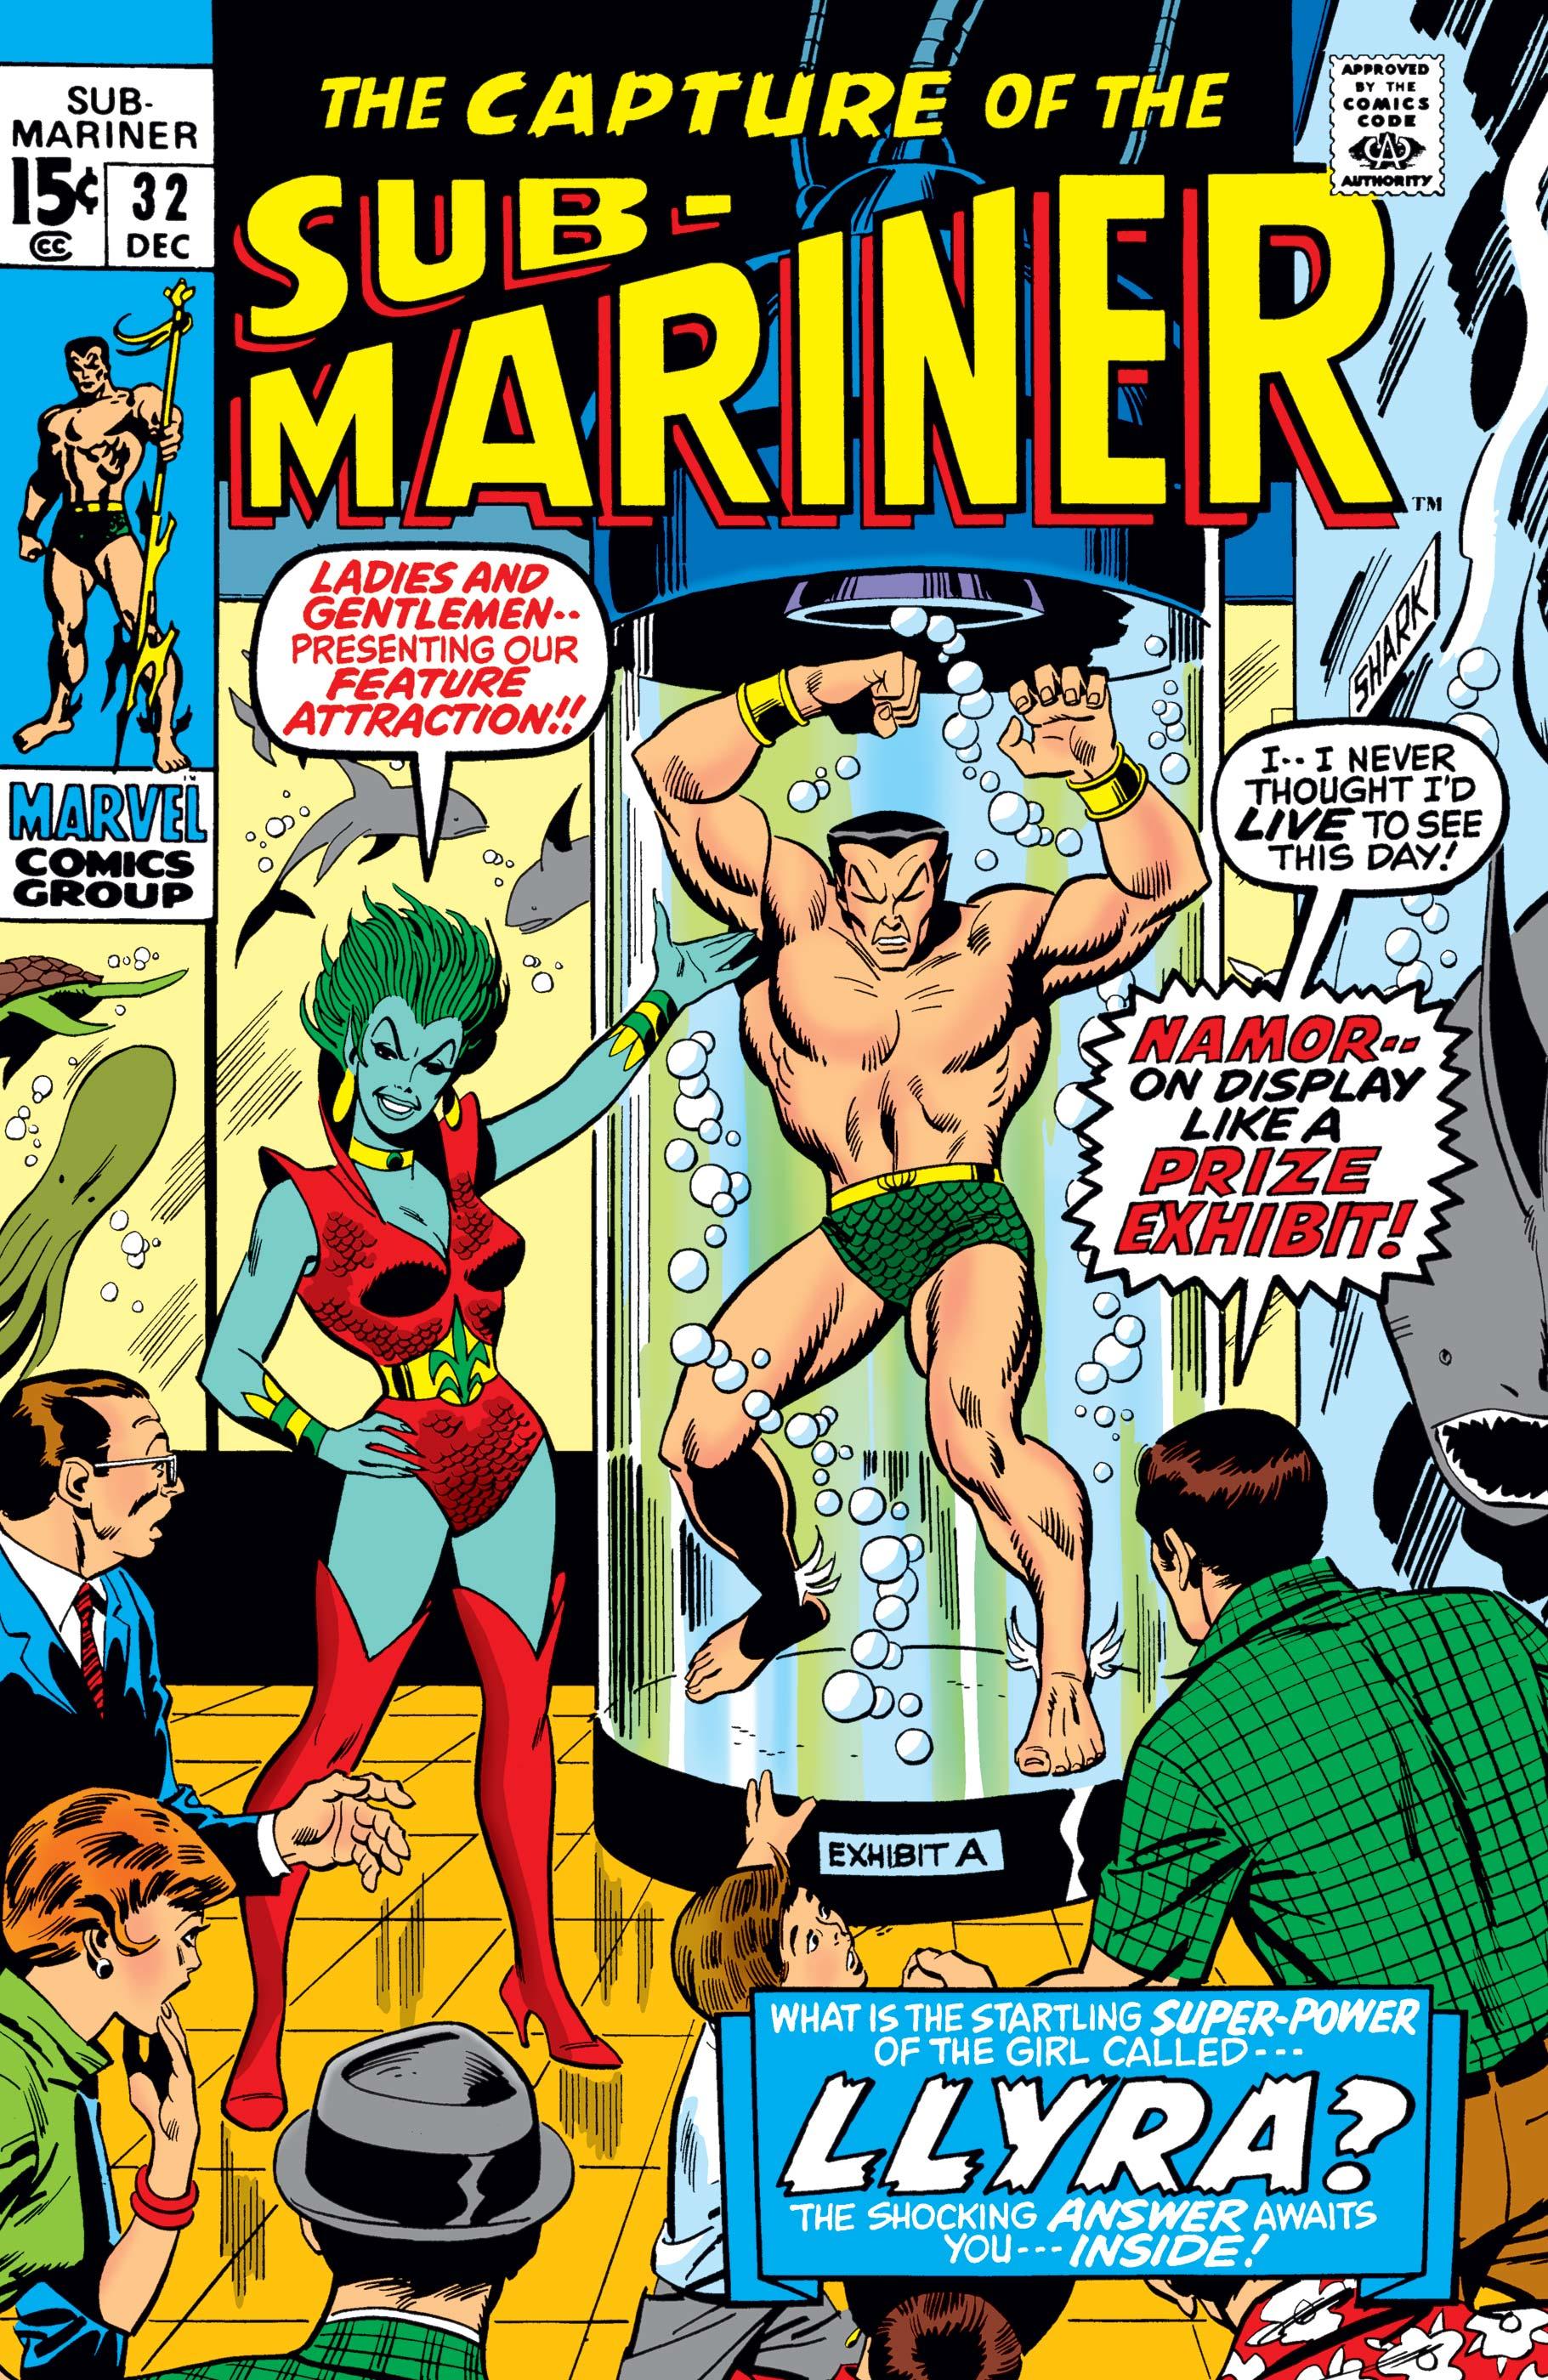 Sub-Mariner (1968) #32